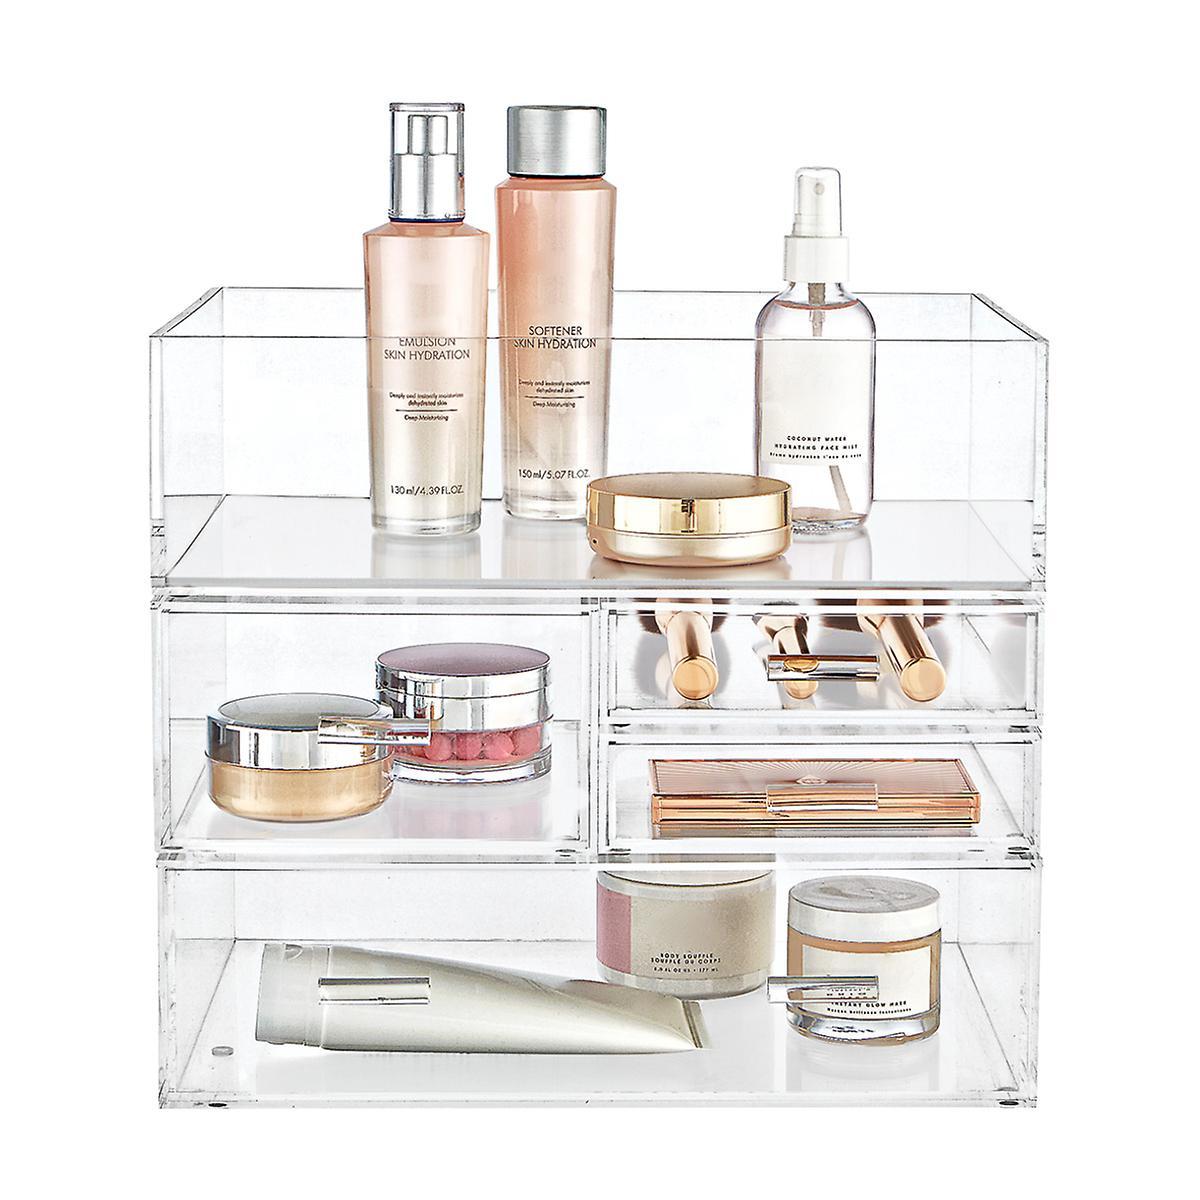 Luxe Acrylic Makeup & Skincare Storage Starter Kit